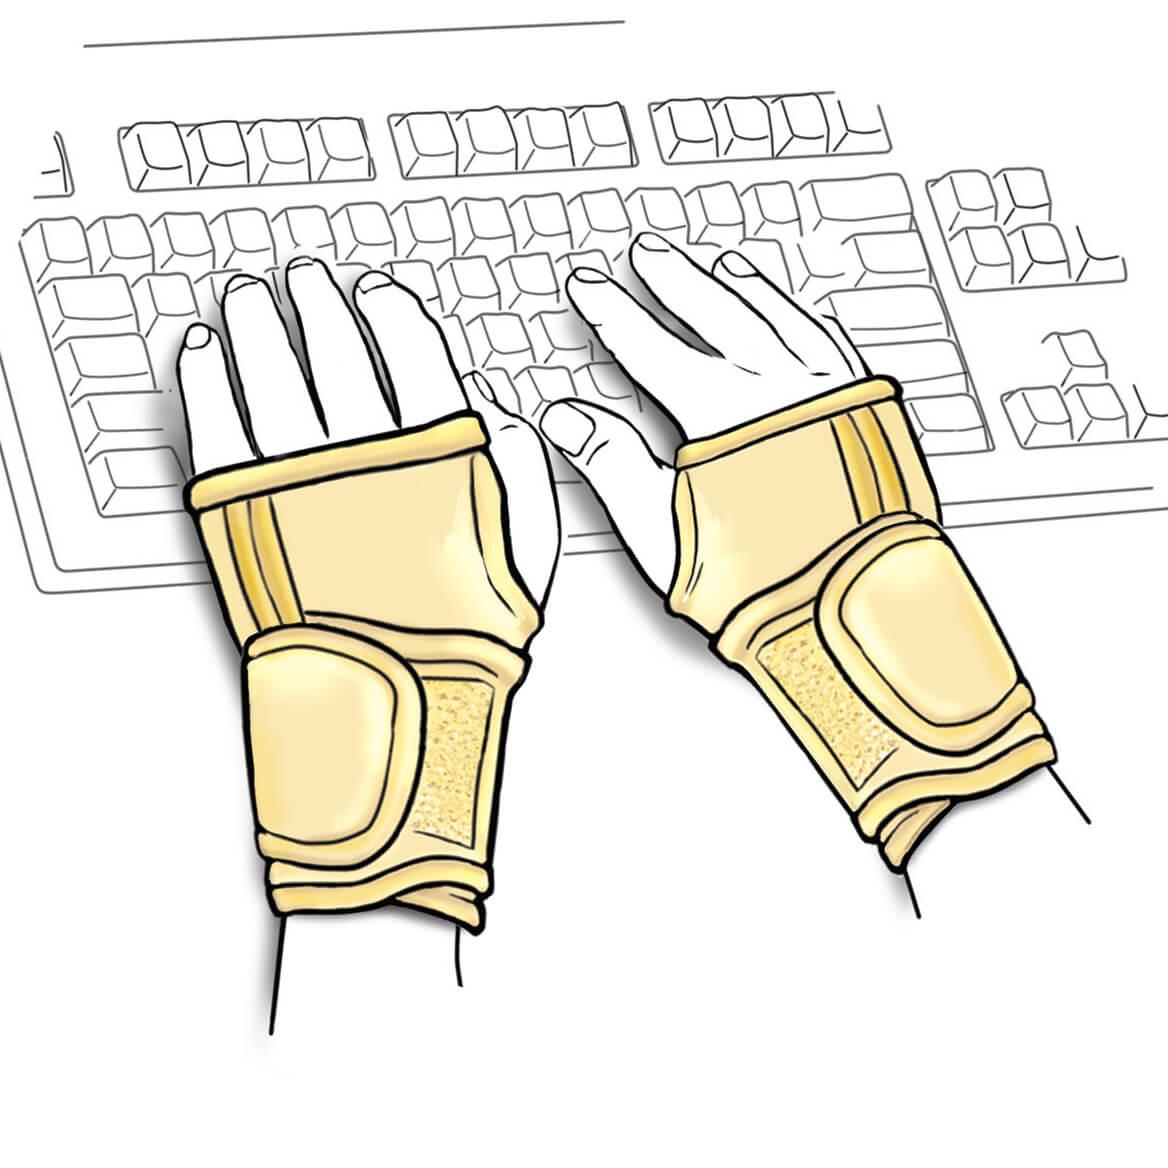 Arthritis Wrist Support-369989